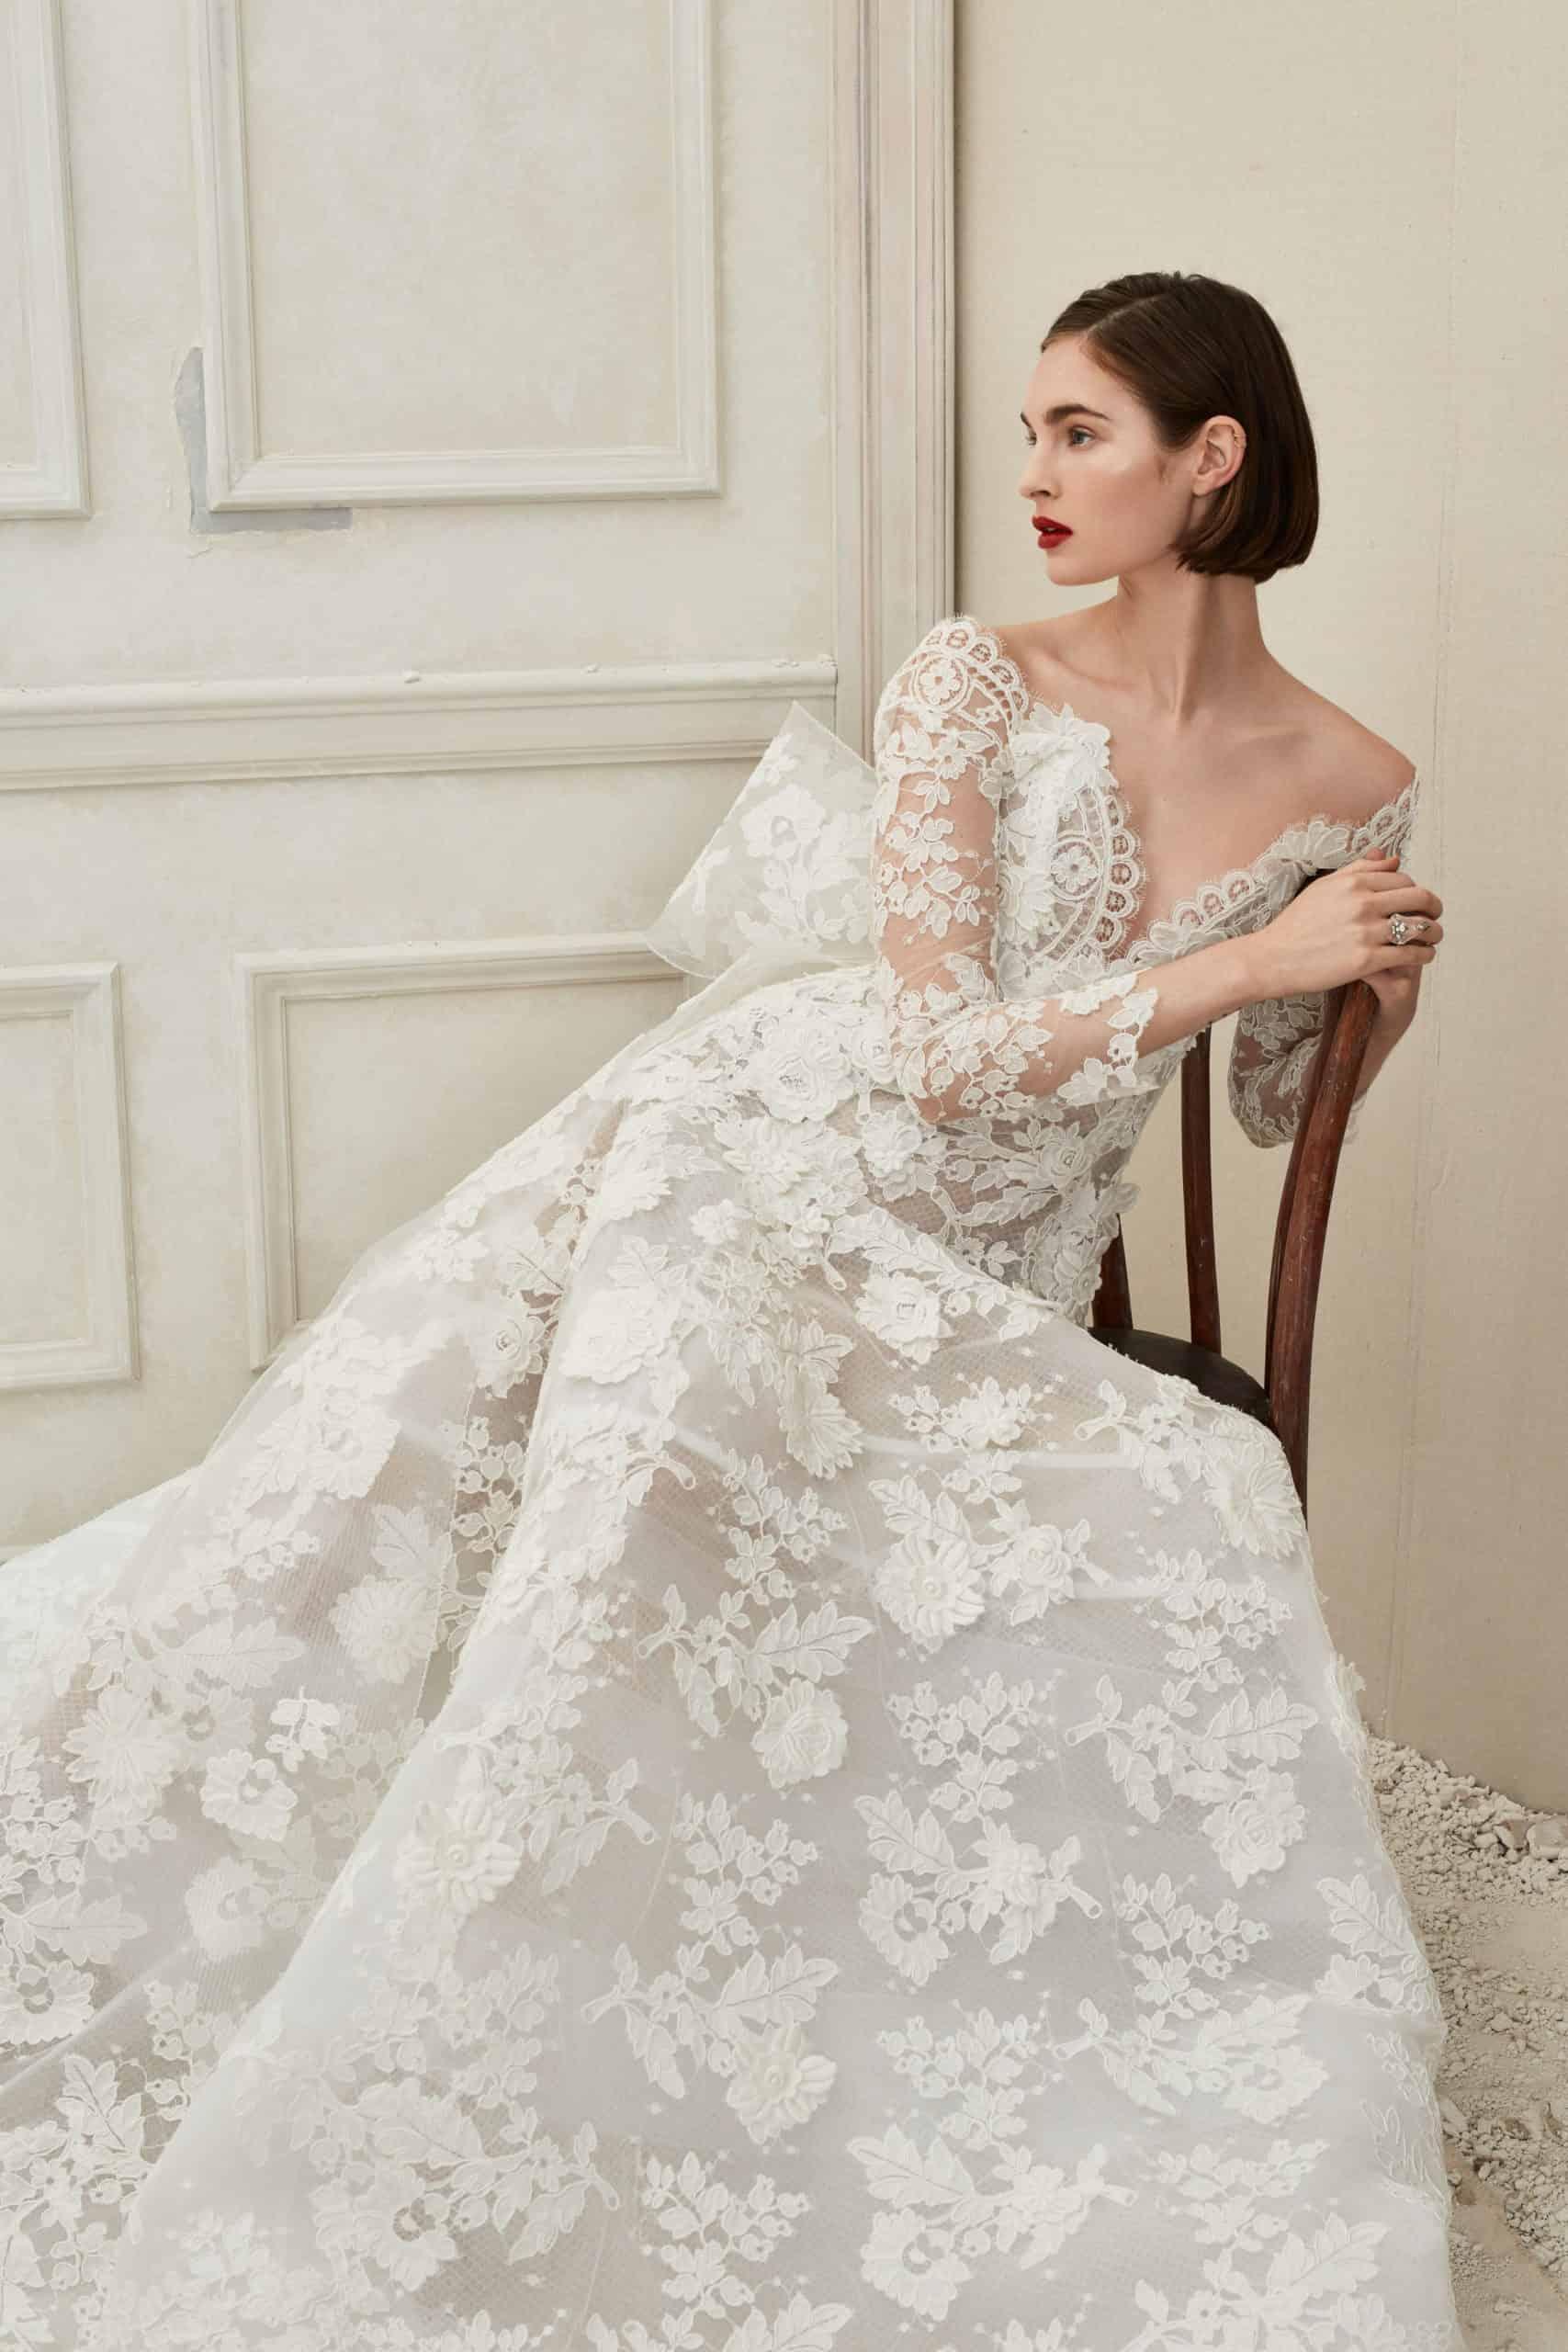 lace wedding dress with a back bow fall 2019 by Oscar de la Renta